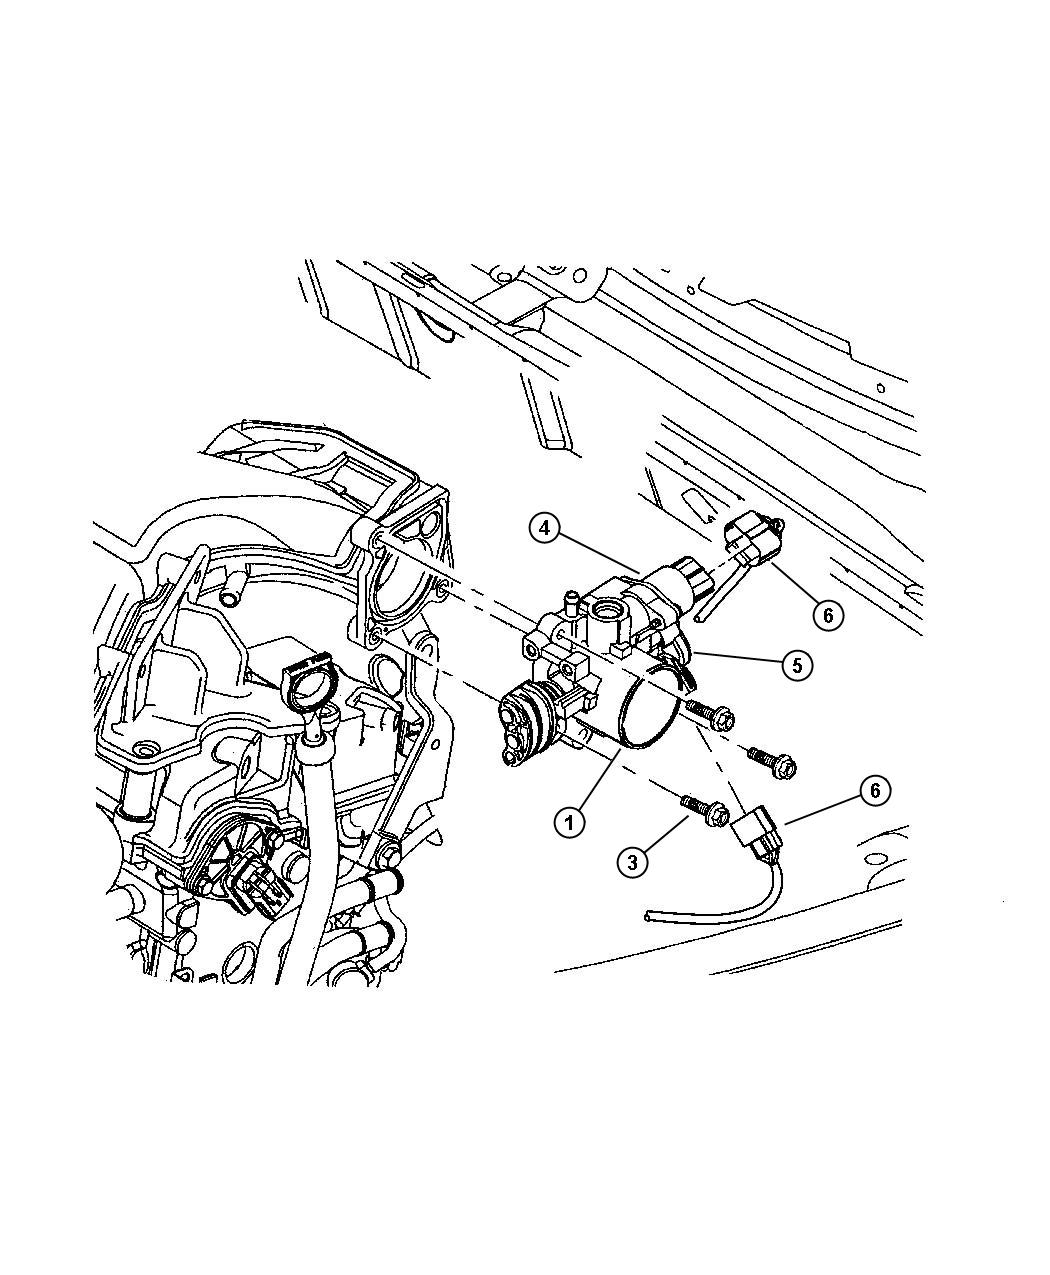 Plymouth Breeze Sensor  Throttle Position  Smpiengine